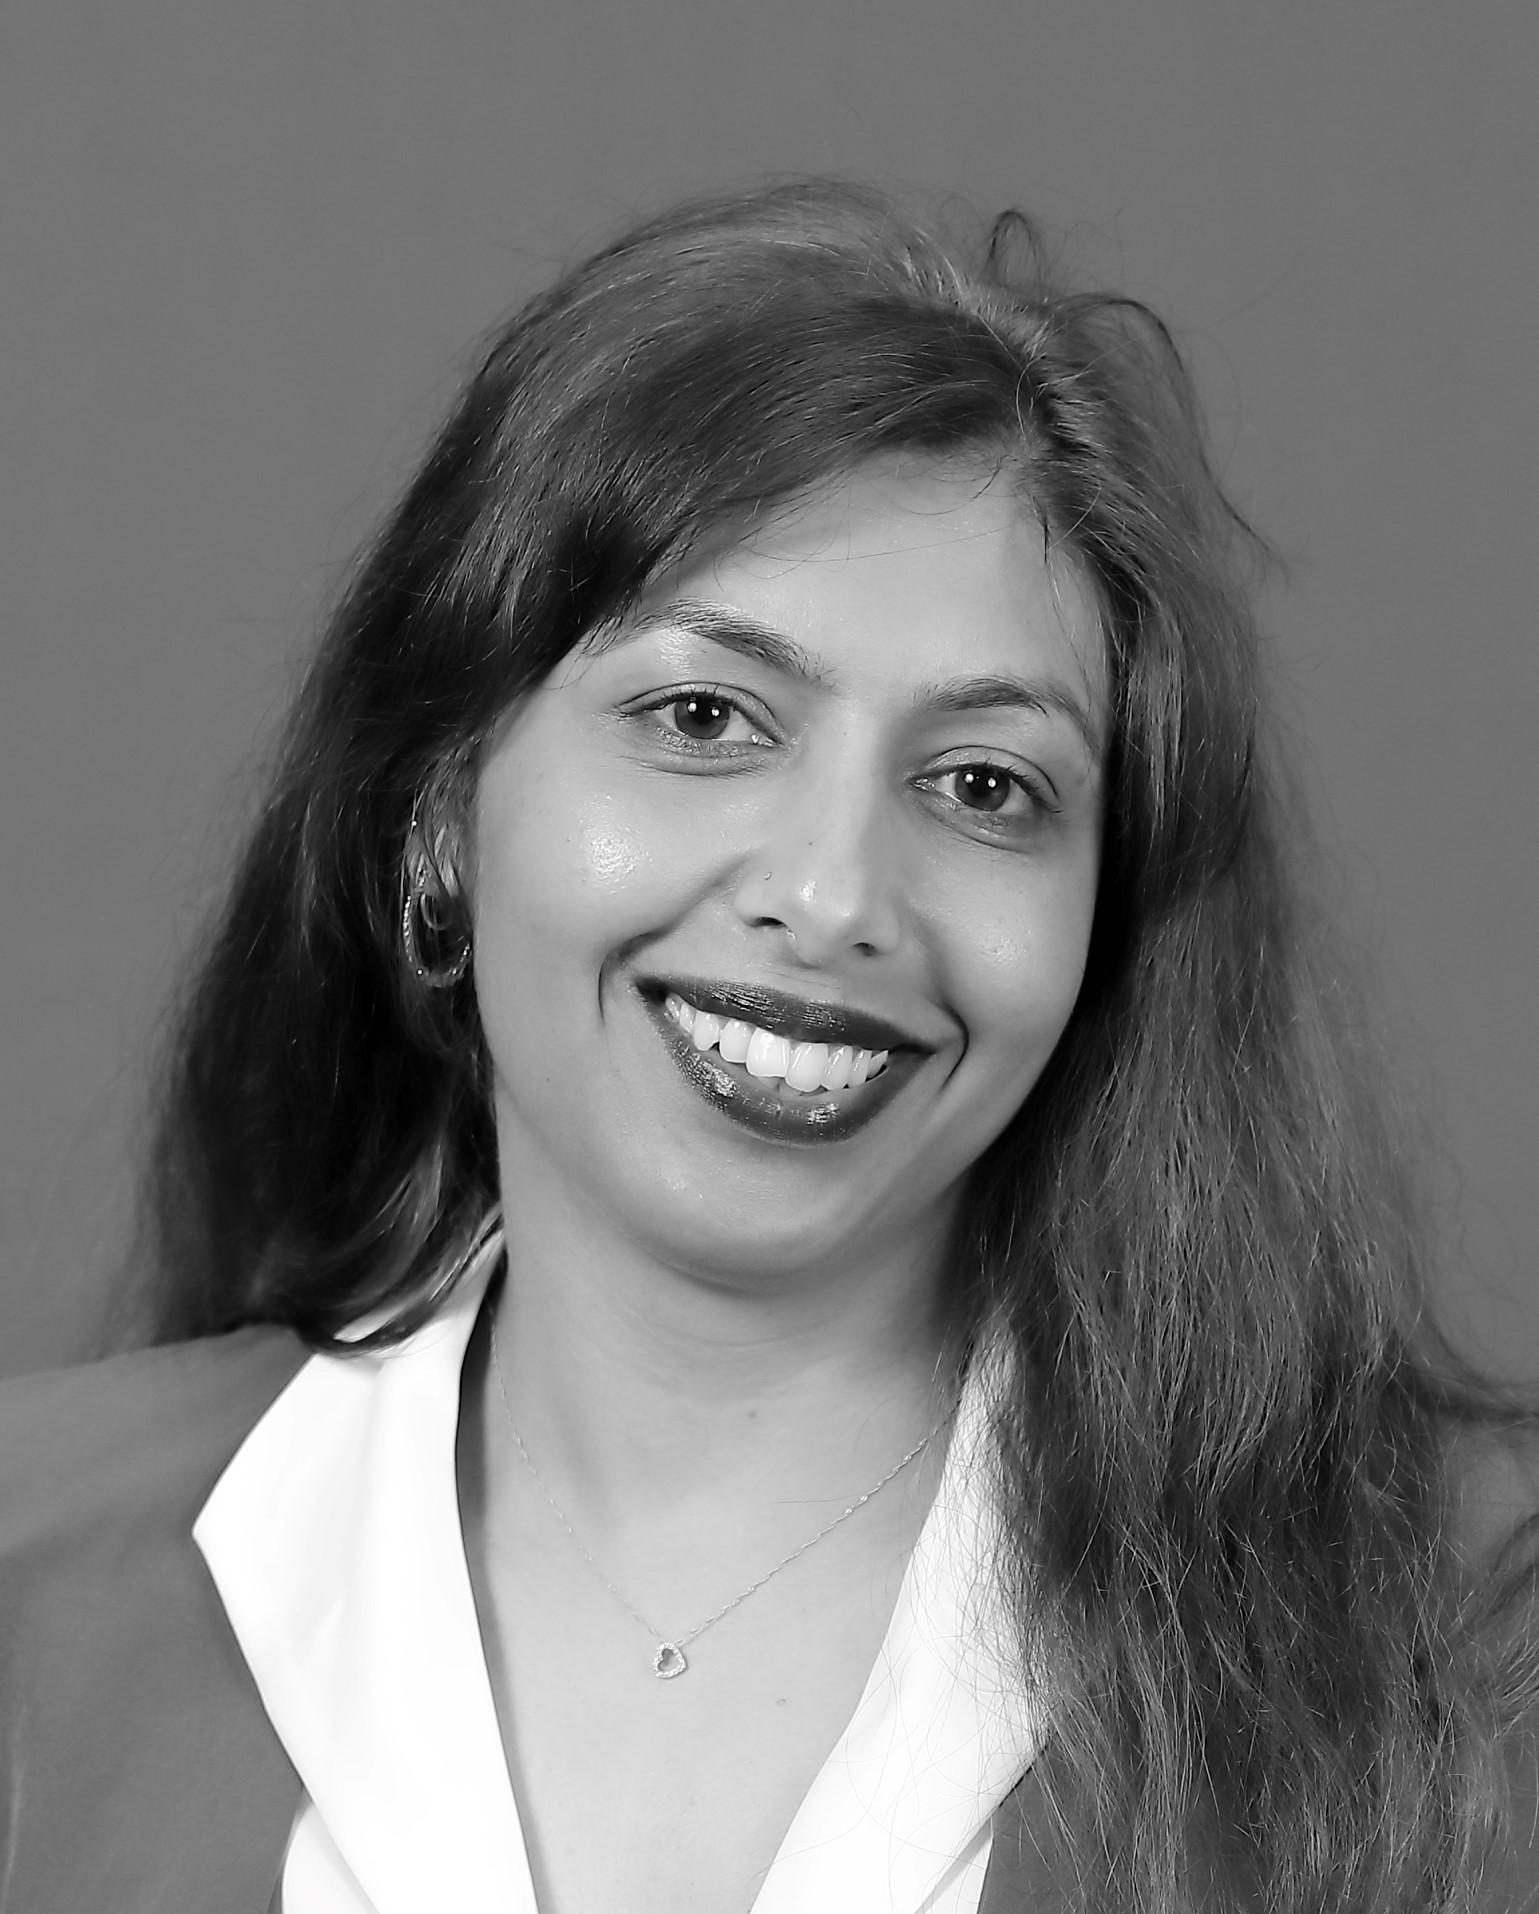 Radhika Beetham